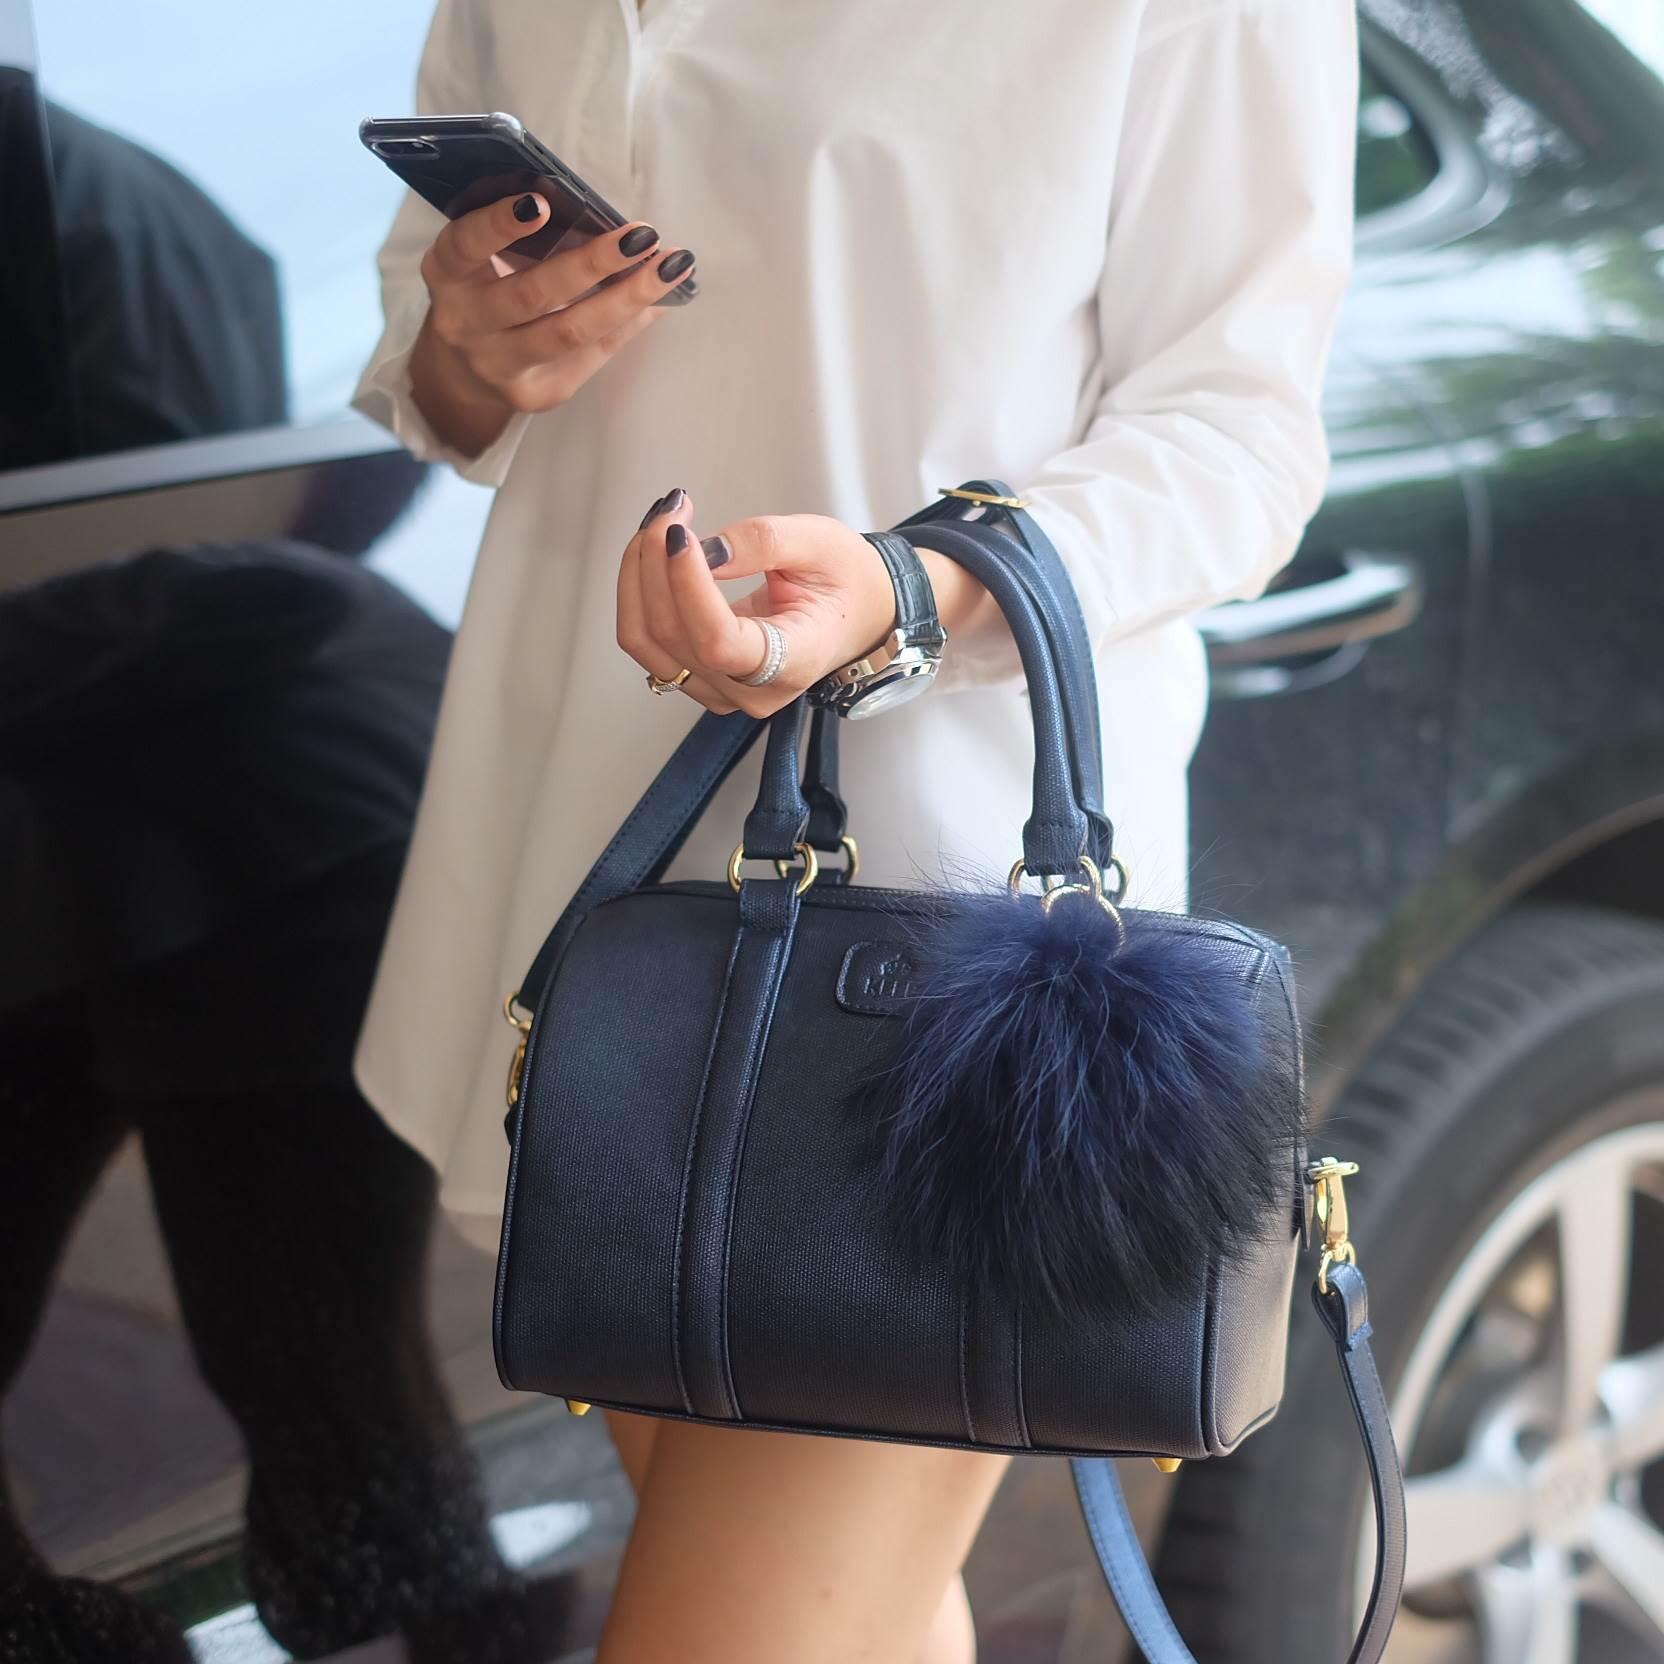 KEEP Glitter Charcoal leather Pillow bag สวย น่ารัก ขนาดตอบทุกโจทย์การใช้งาน